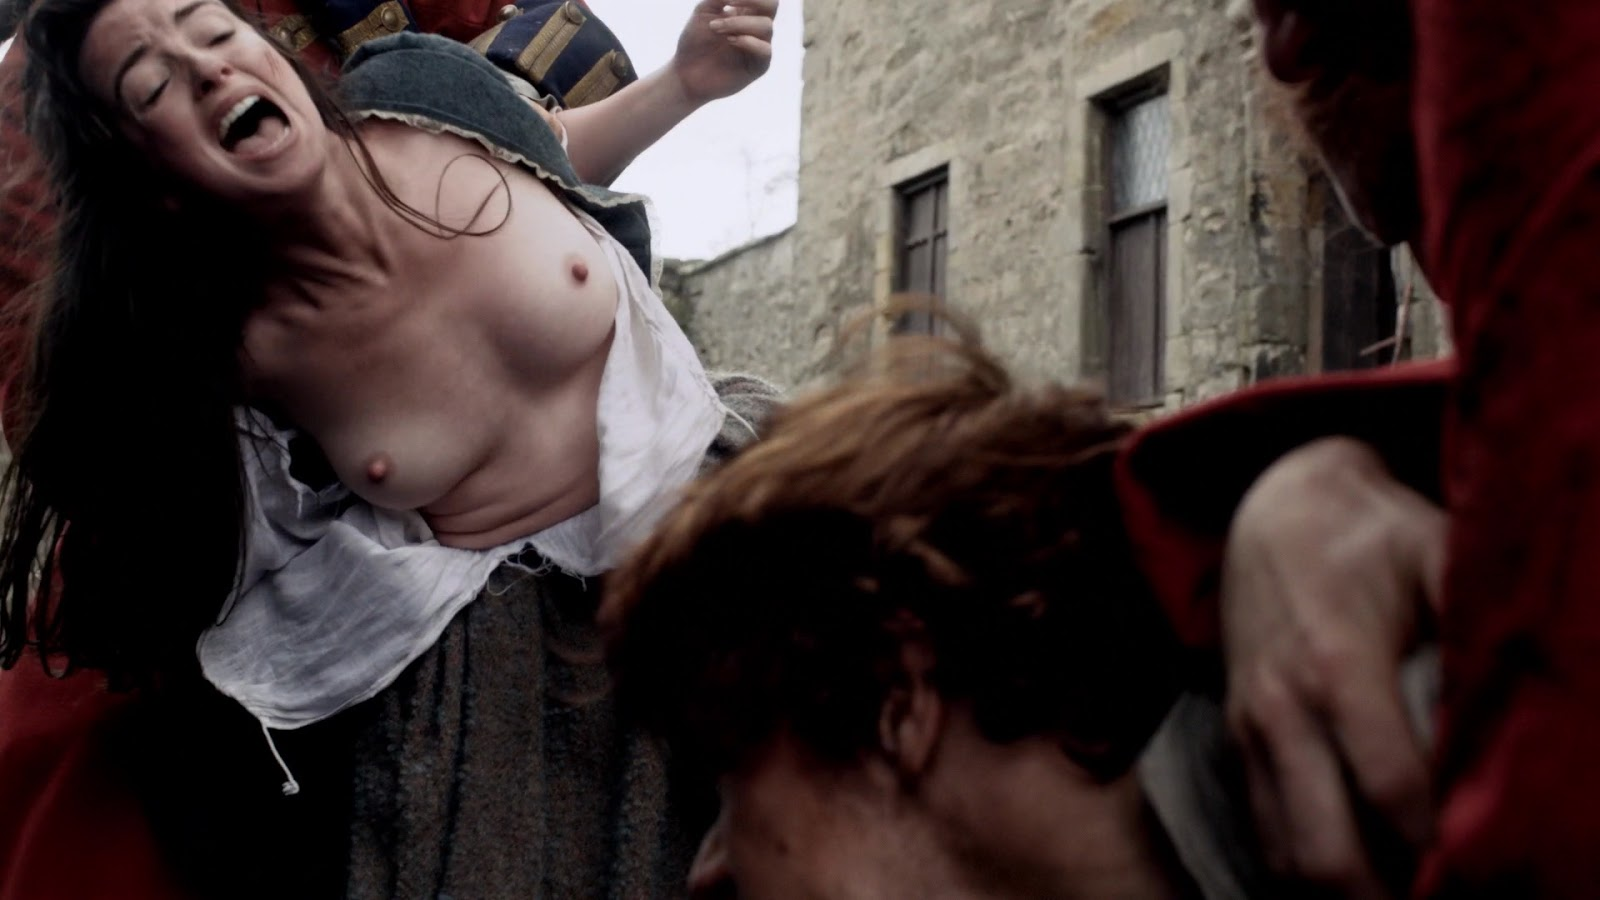 Caitriona Balfe's Outrageous Boobies In Outlander